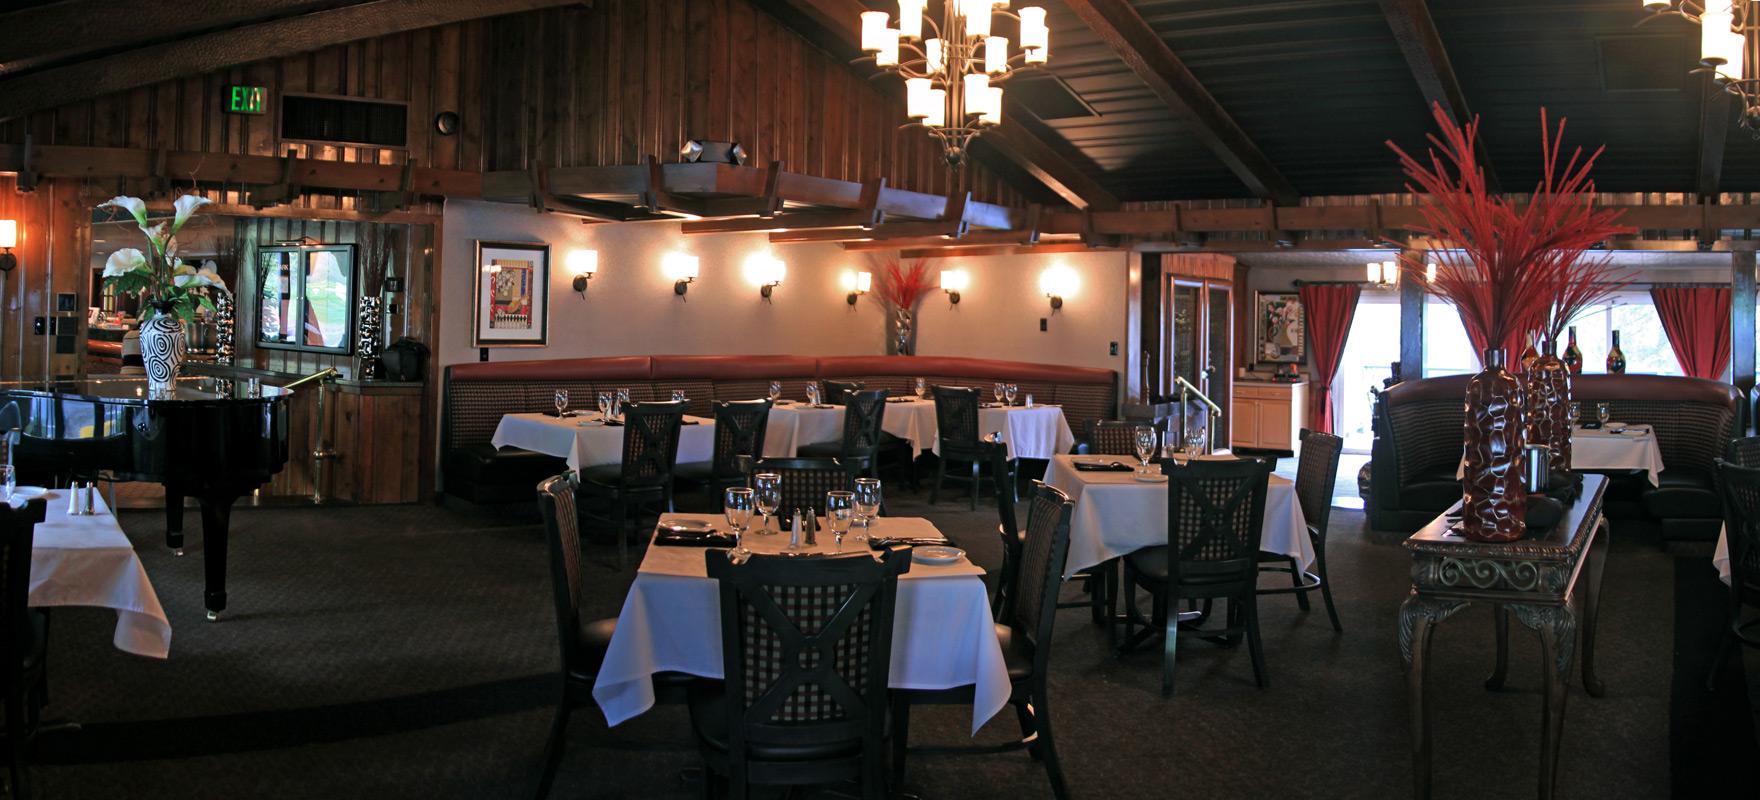 Shilo Inns Suites Hotels Beaverton Oregon